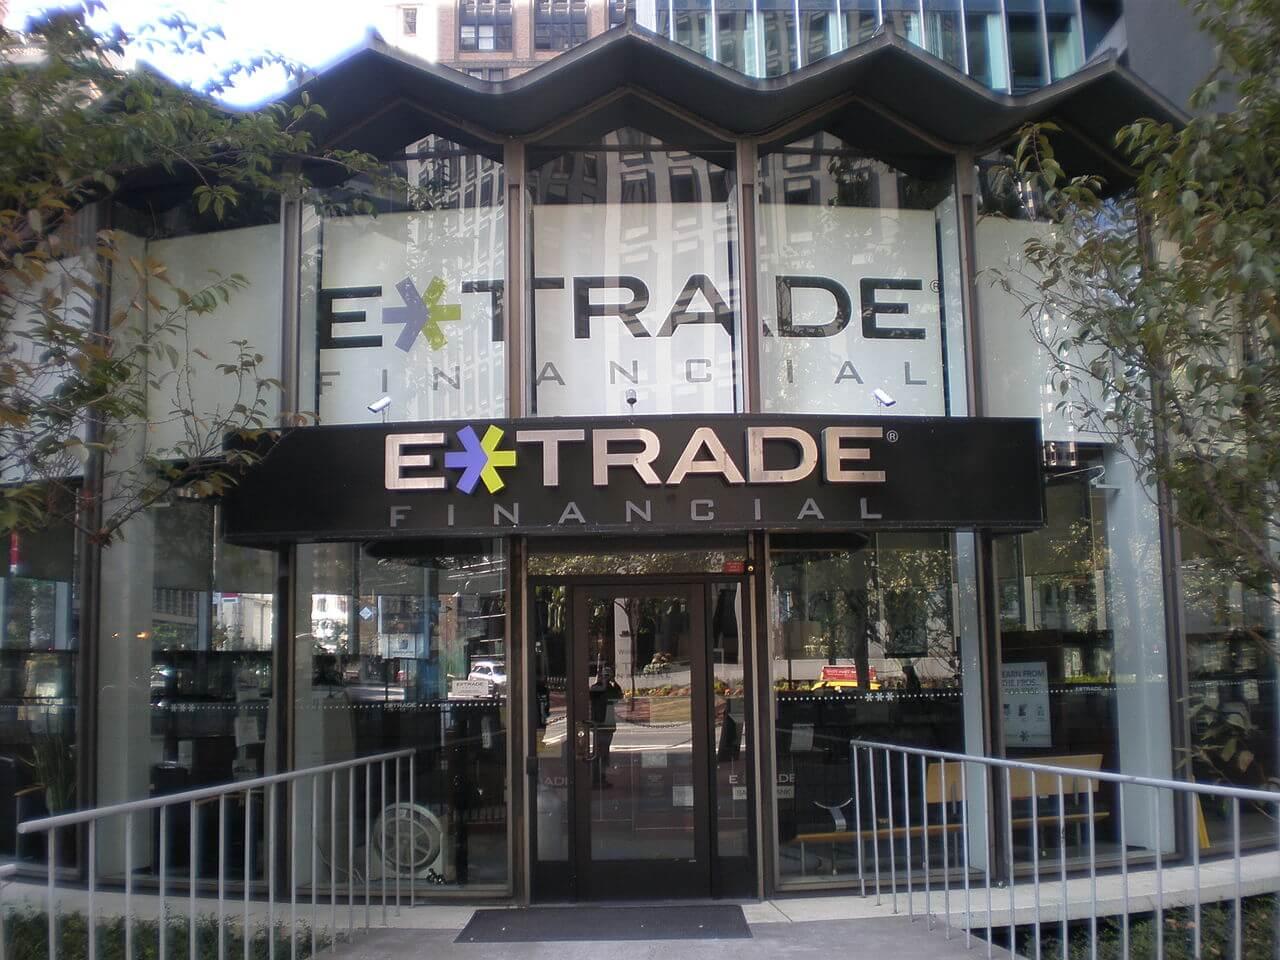 E trade online brokerage review